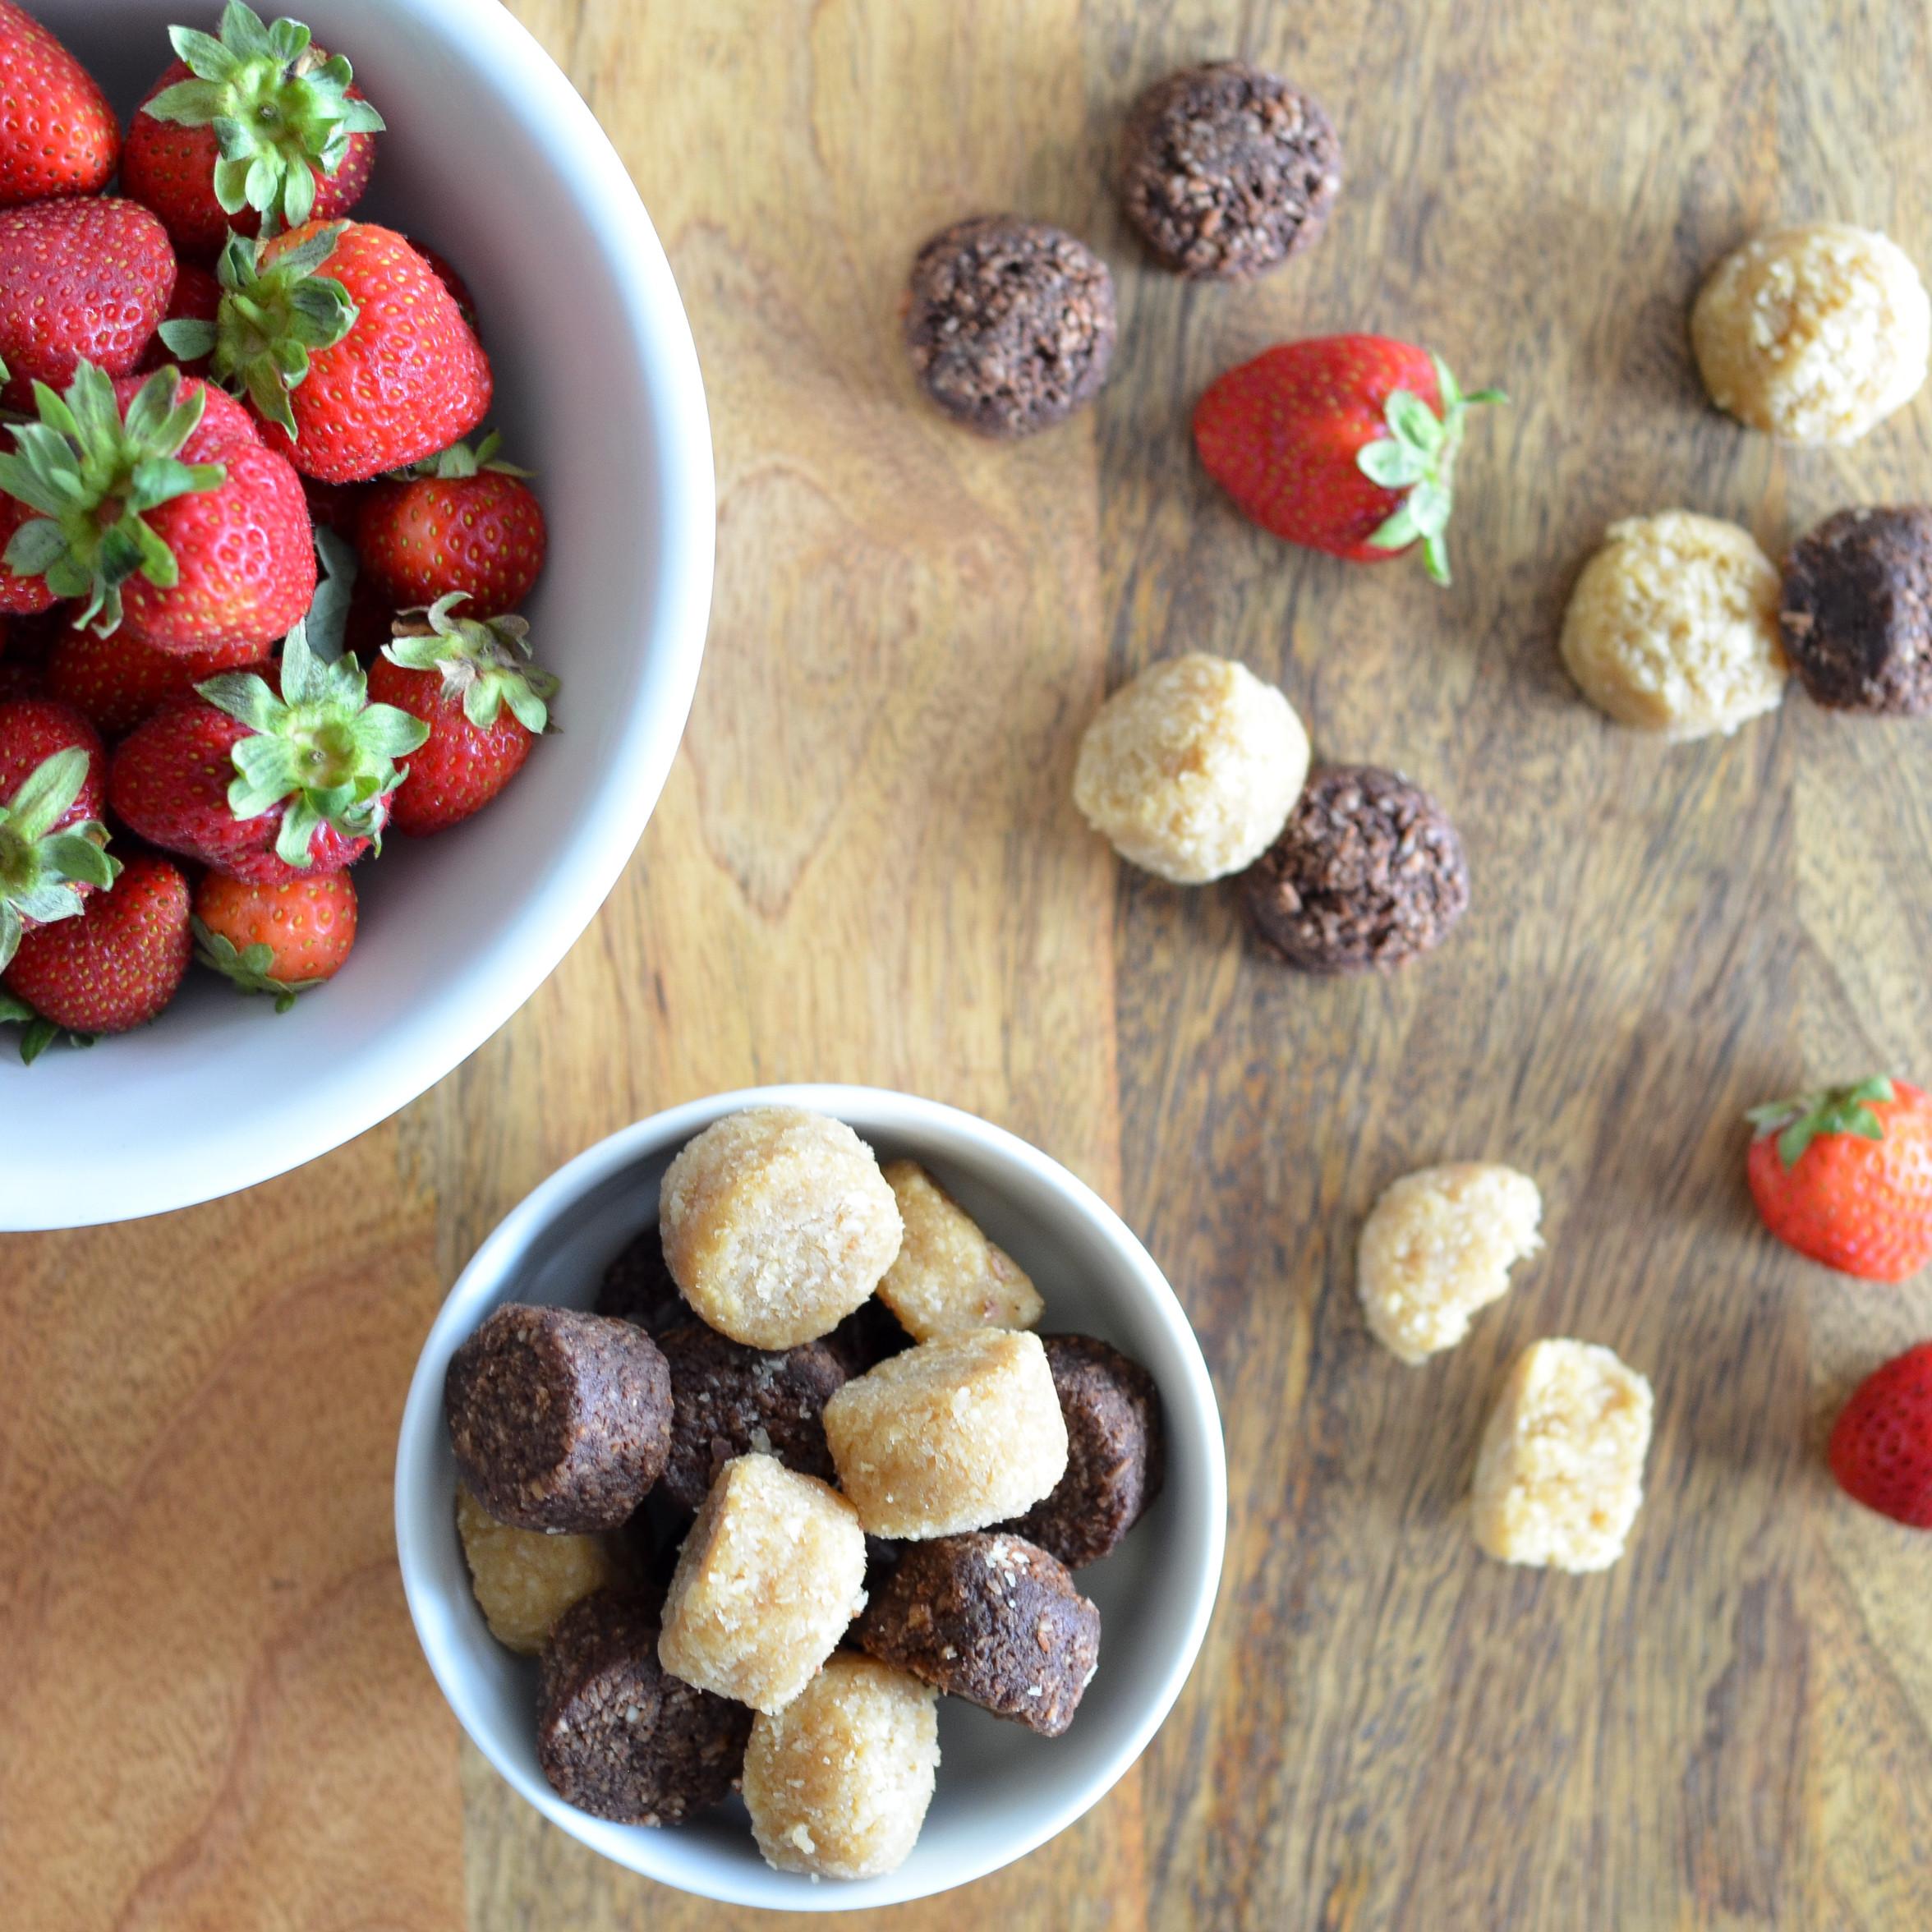 Easy Healthy Dessert  Five Easy No Bake Healthy Dessert Ideas The